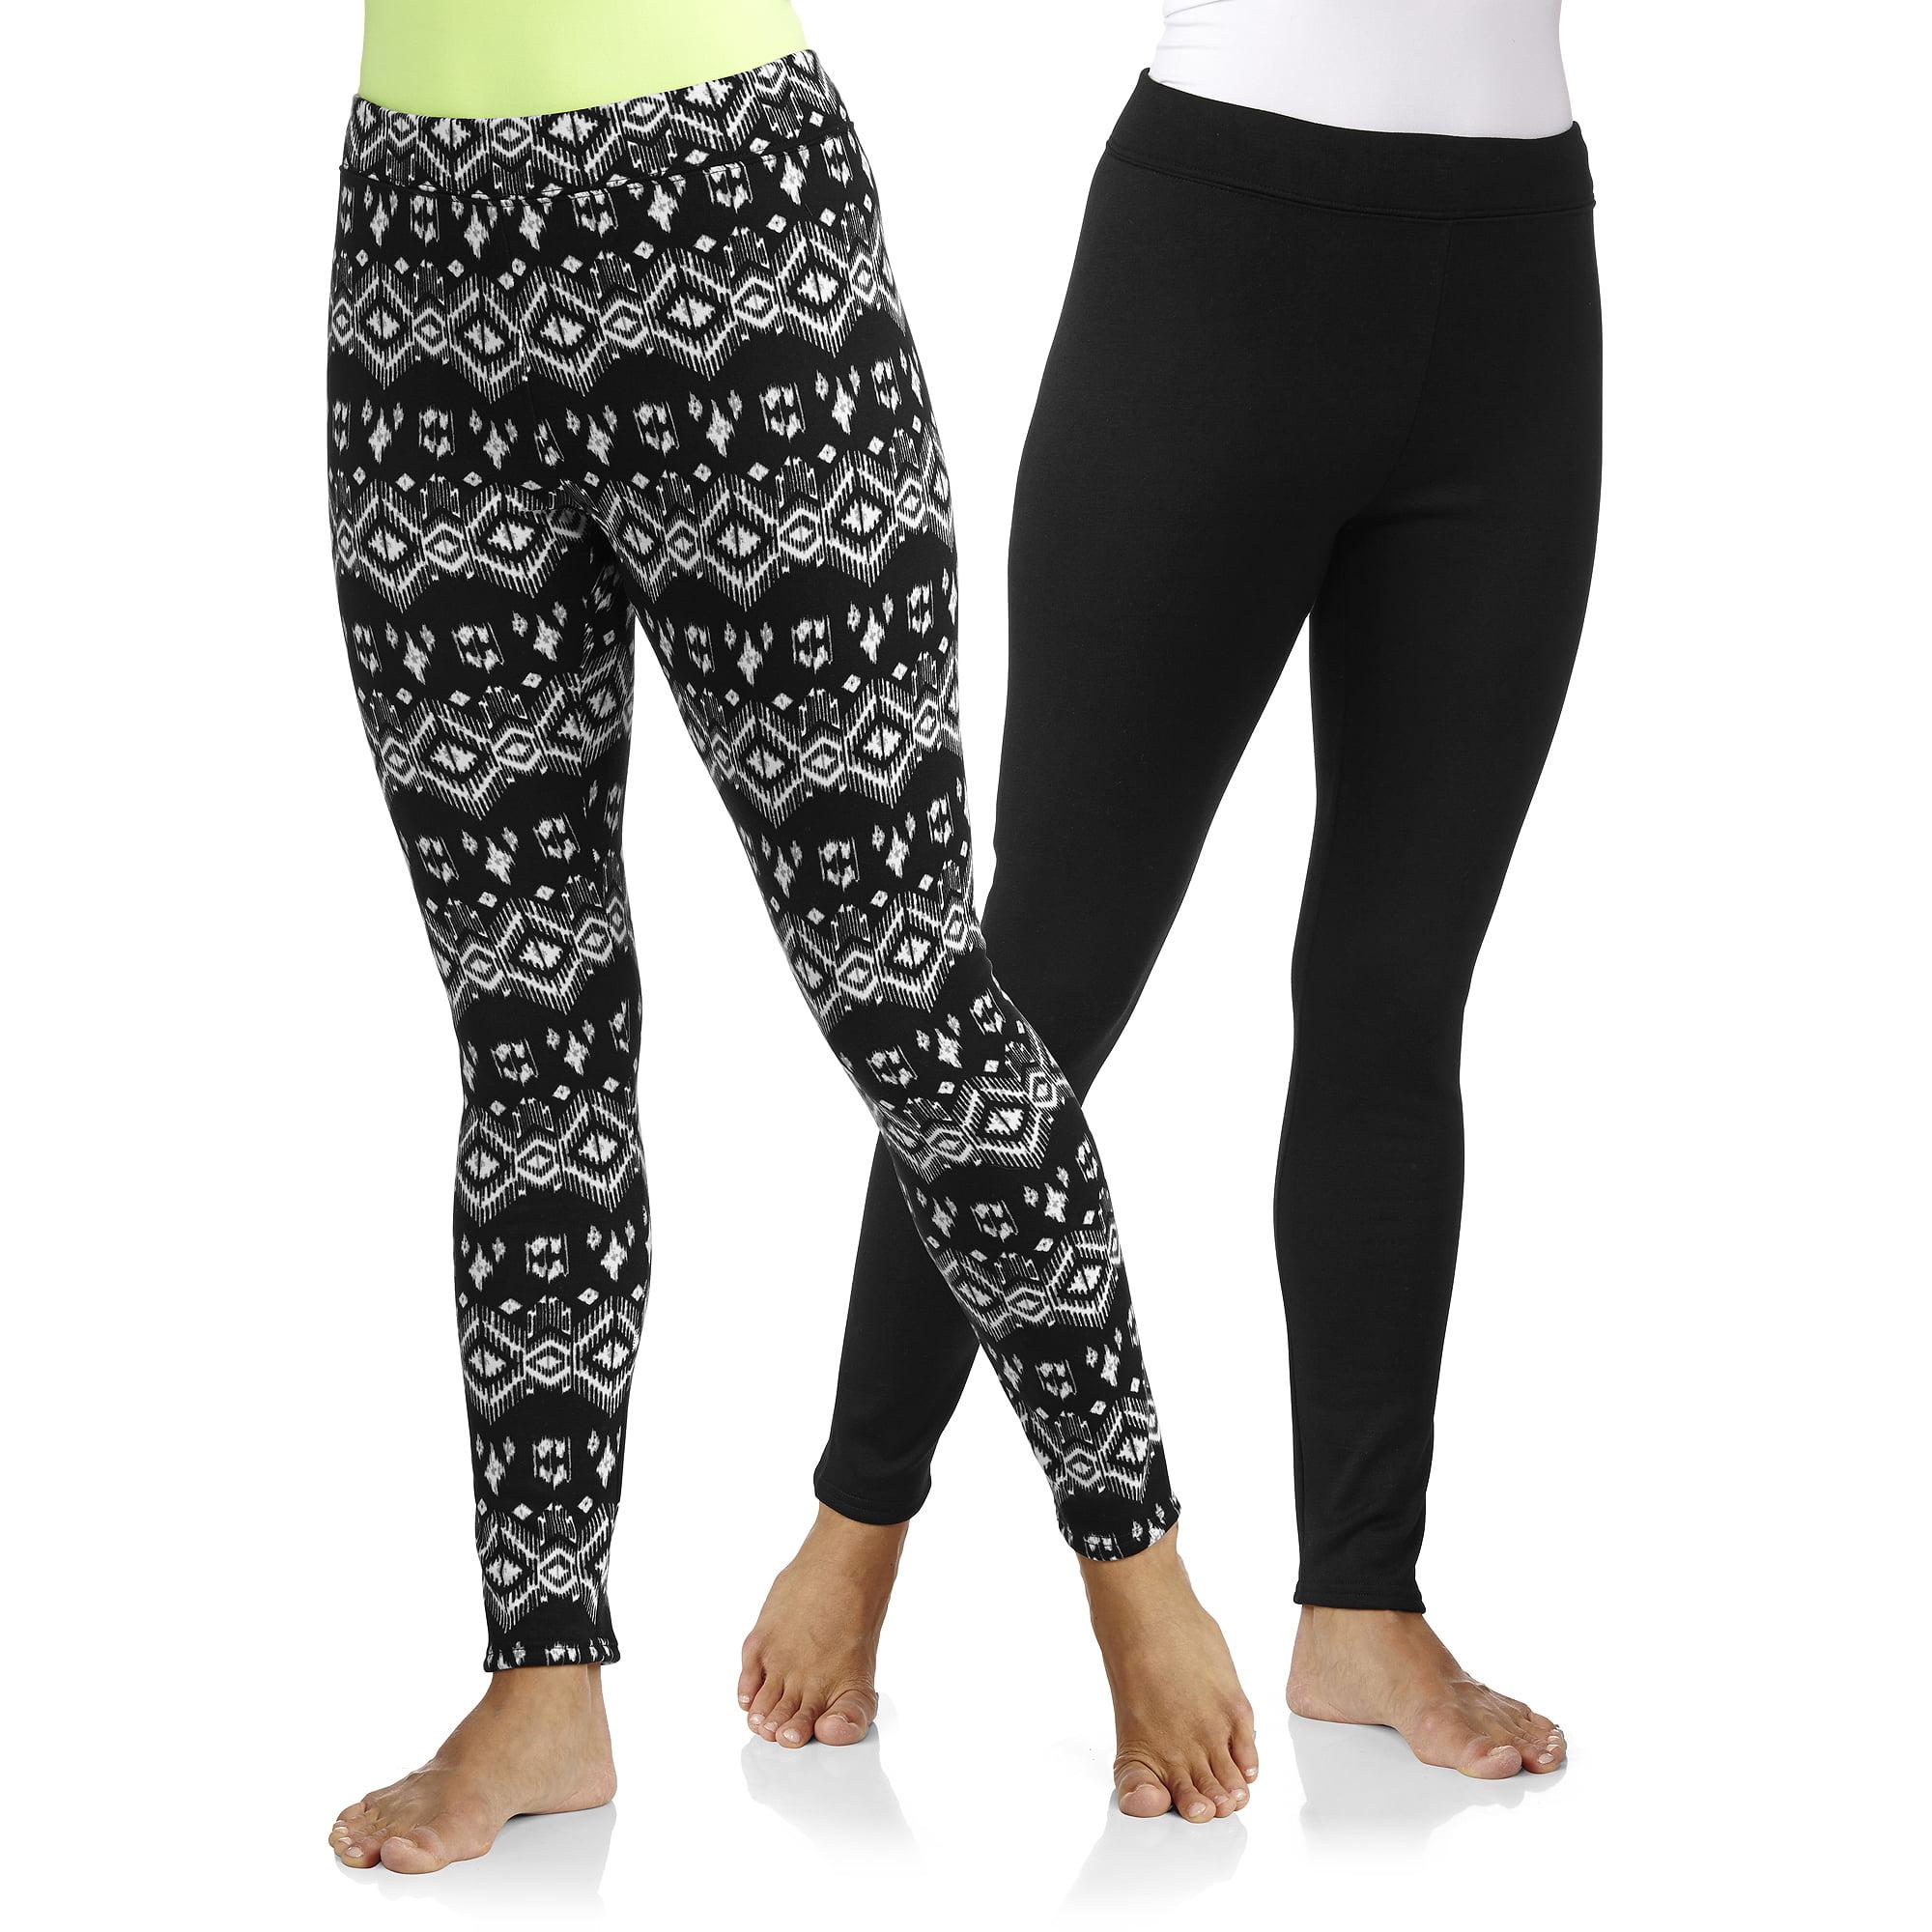 a0519820be77c6 Concepts - Women's Cozy Fleeced Lined Legging 2-Pack - Walmart.com